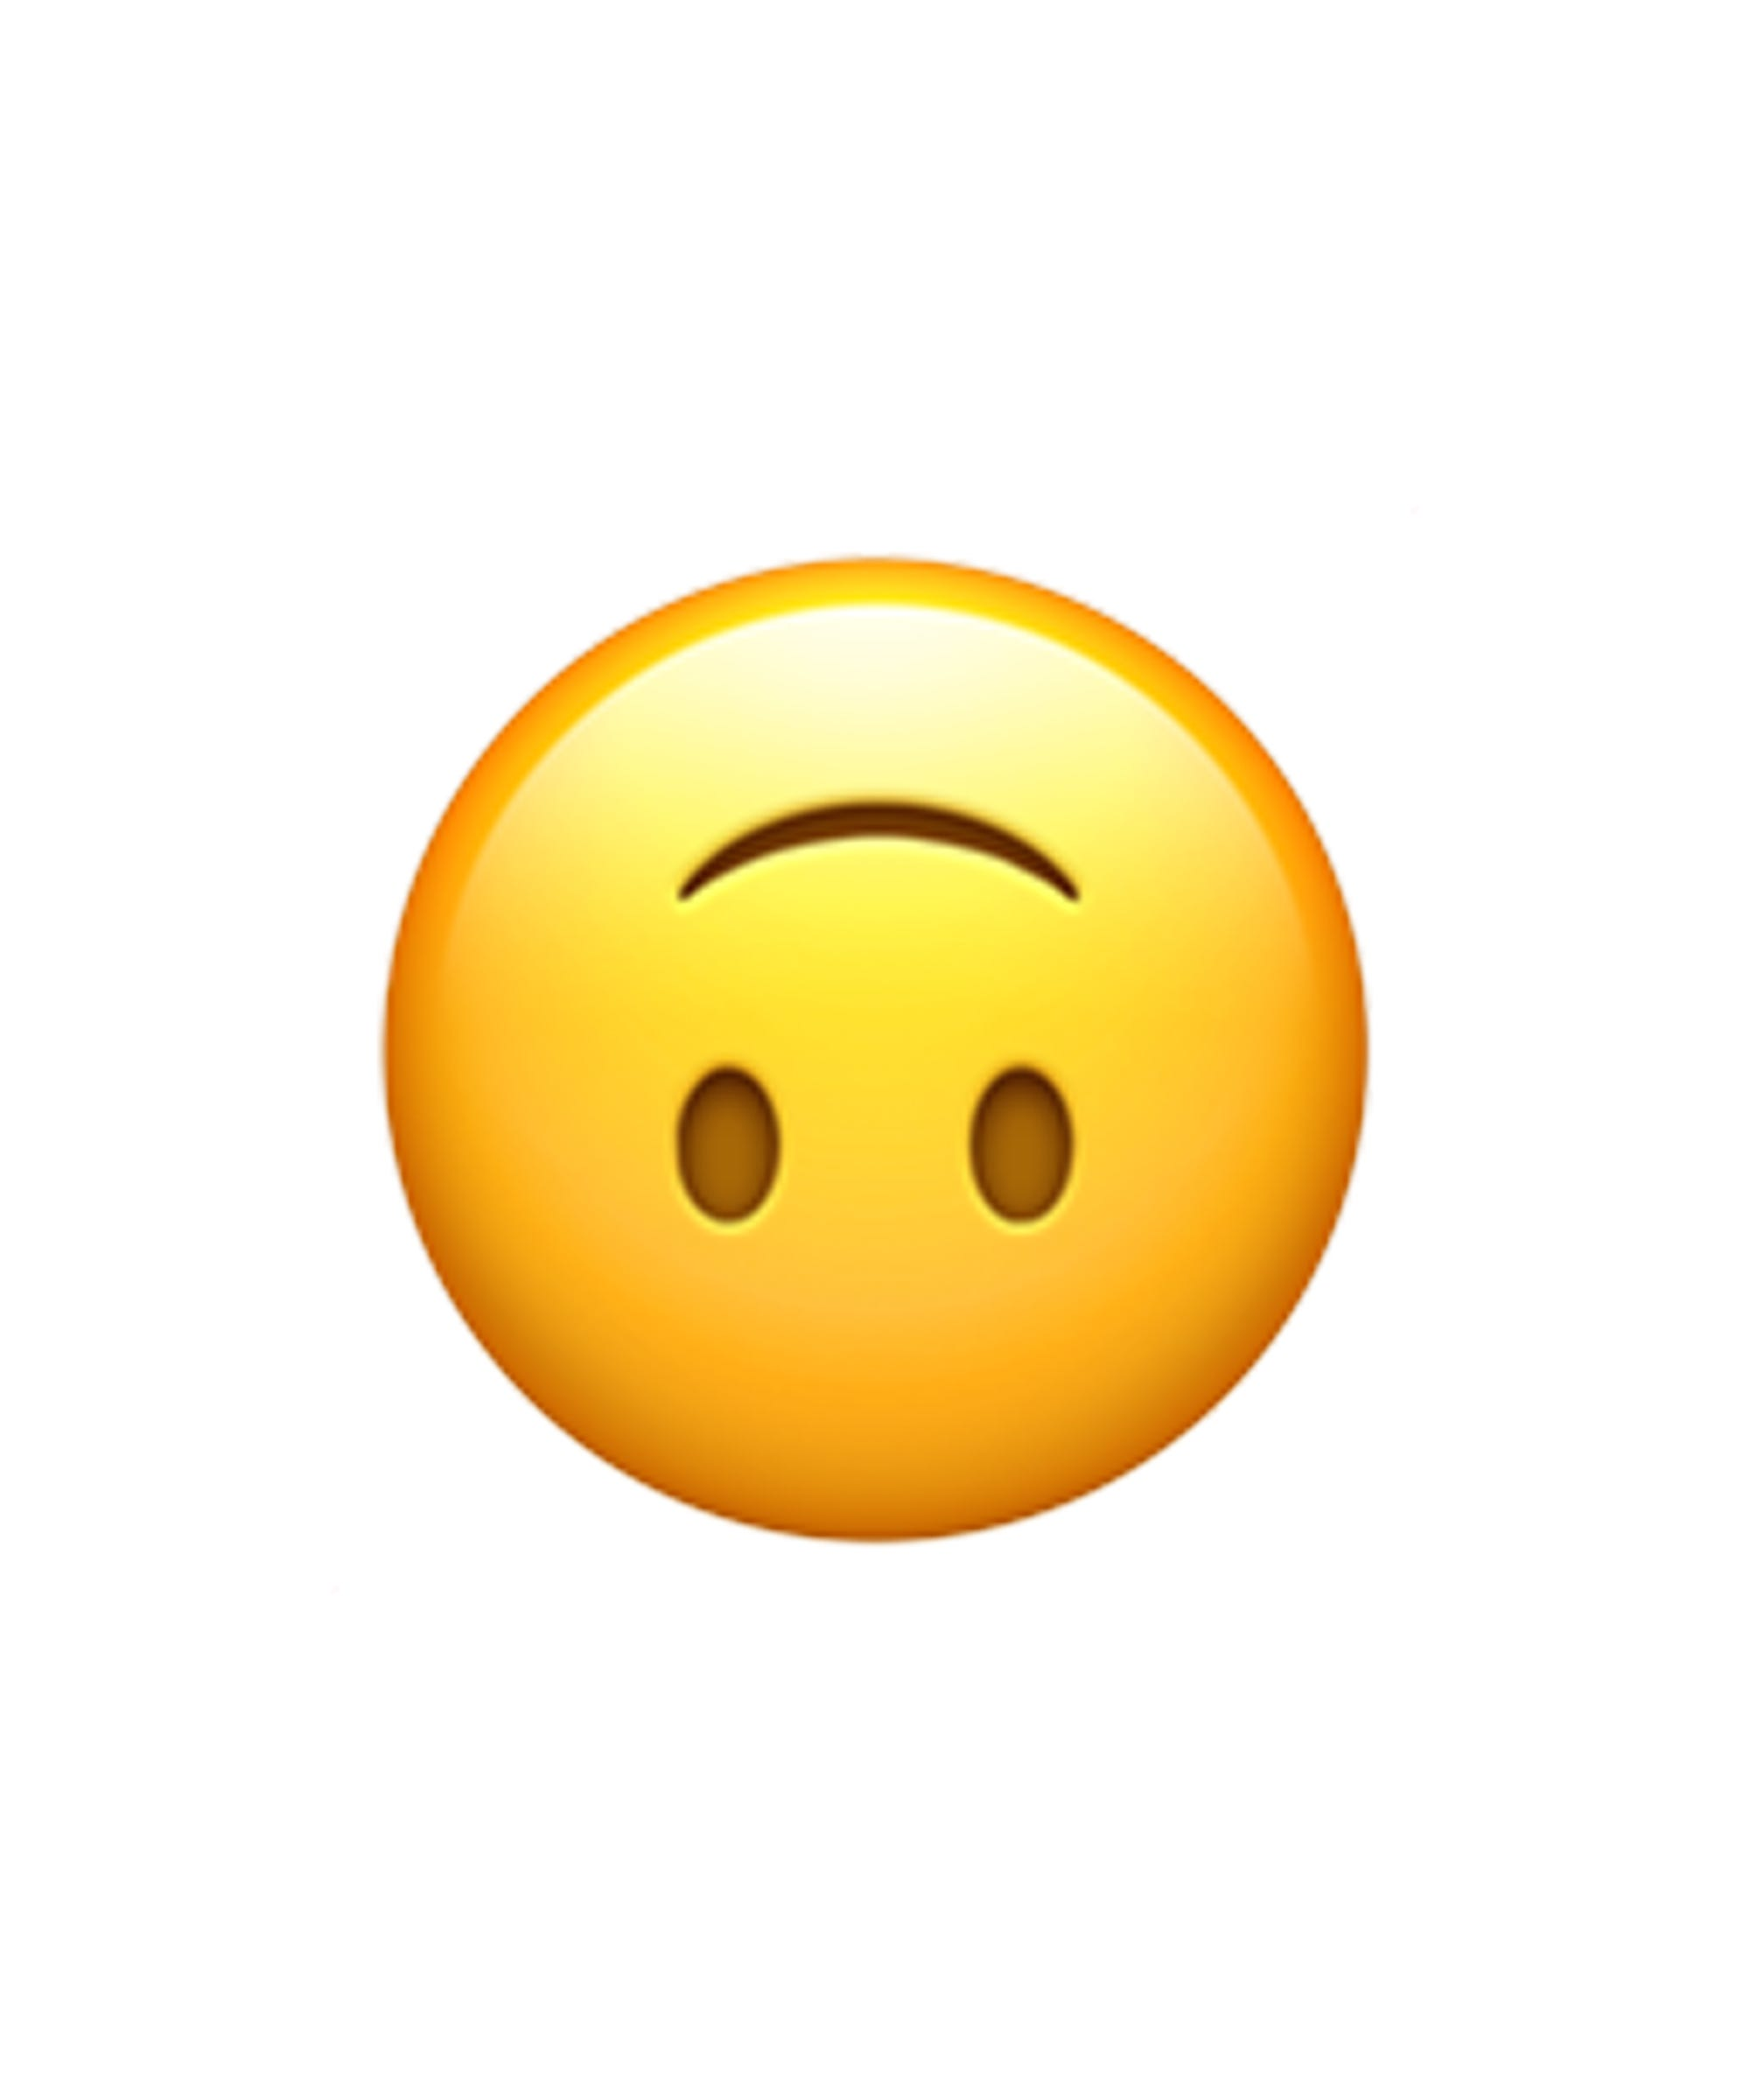 3717fcb73b93 Emoji Meanings Of The Symbols